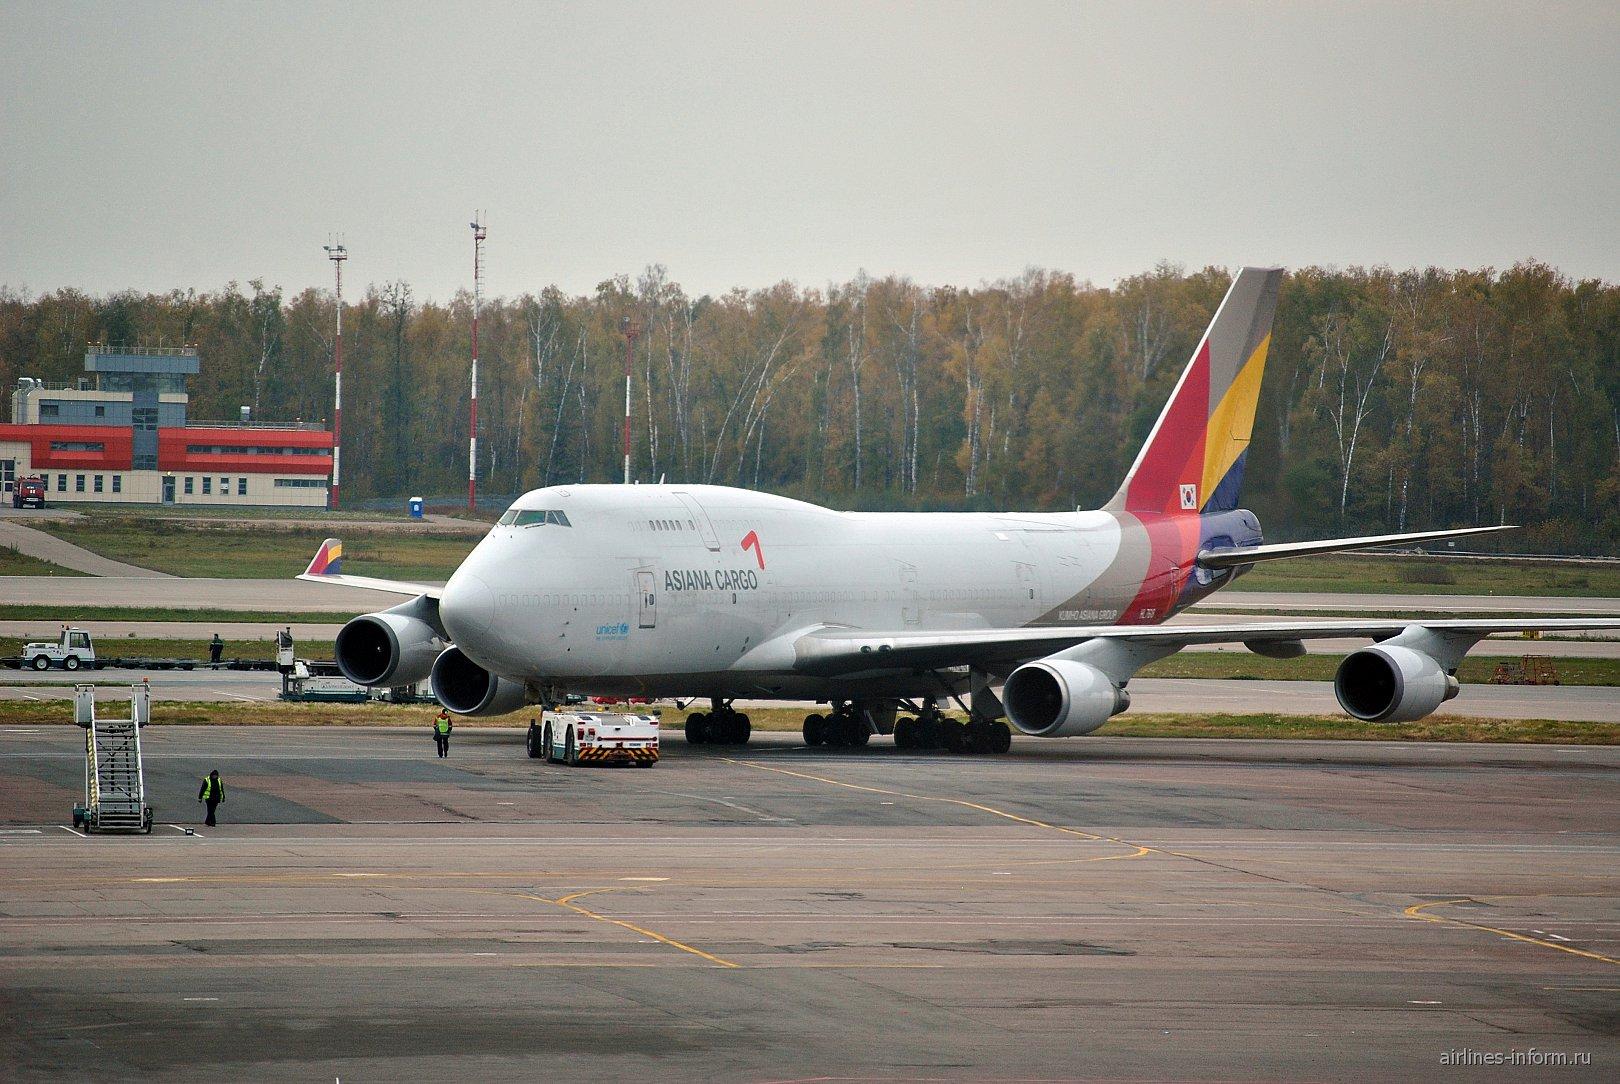 Грузовой Боинг-747-400 авиакомпании Asiana Cargo в аэропорту Домодедово